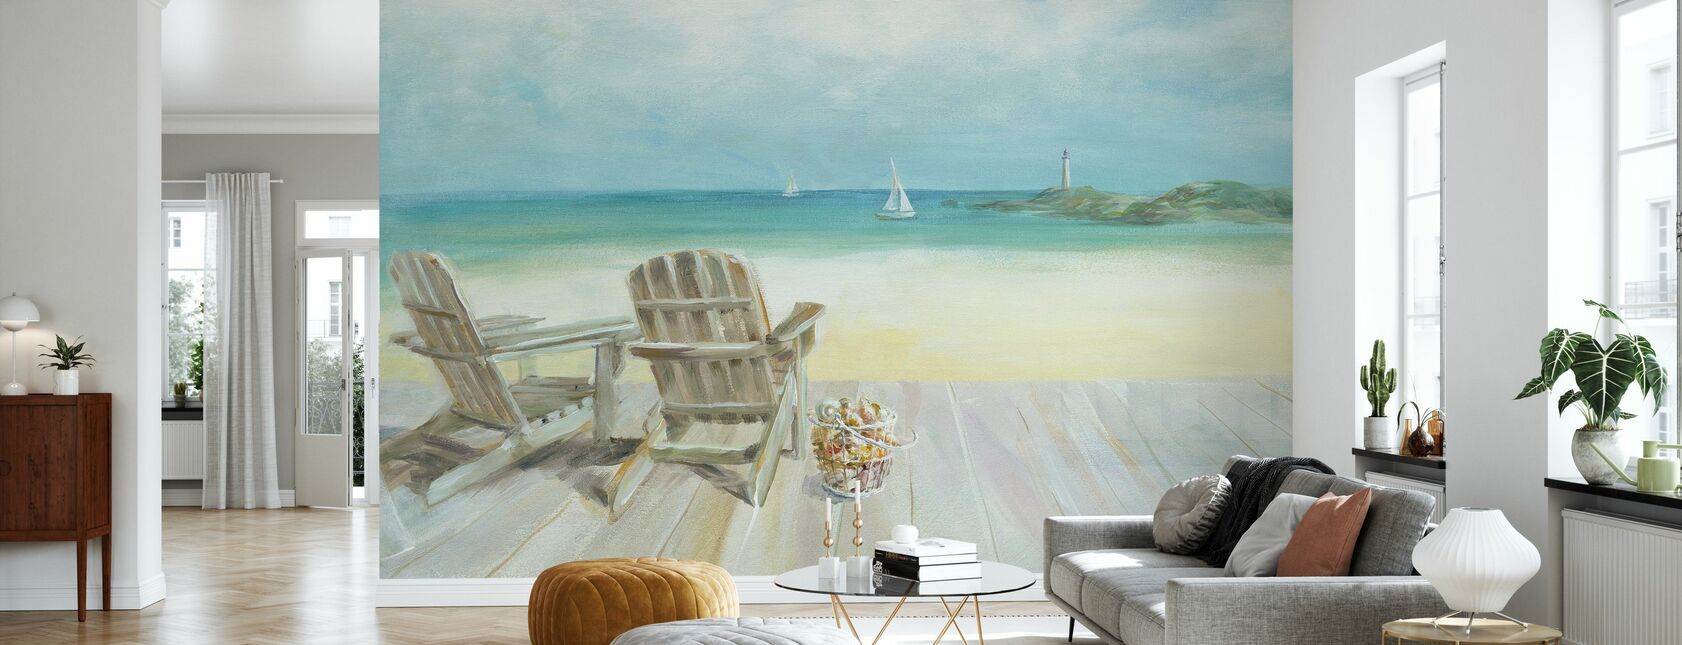 Ocean View - Wallpaper - Living Room